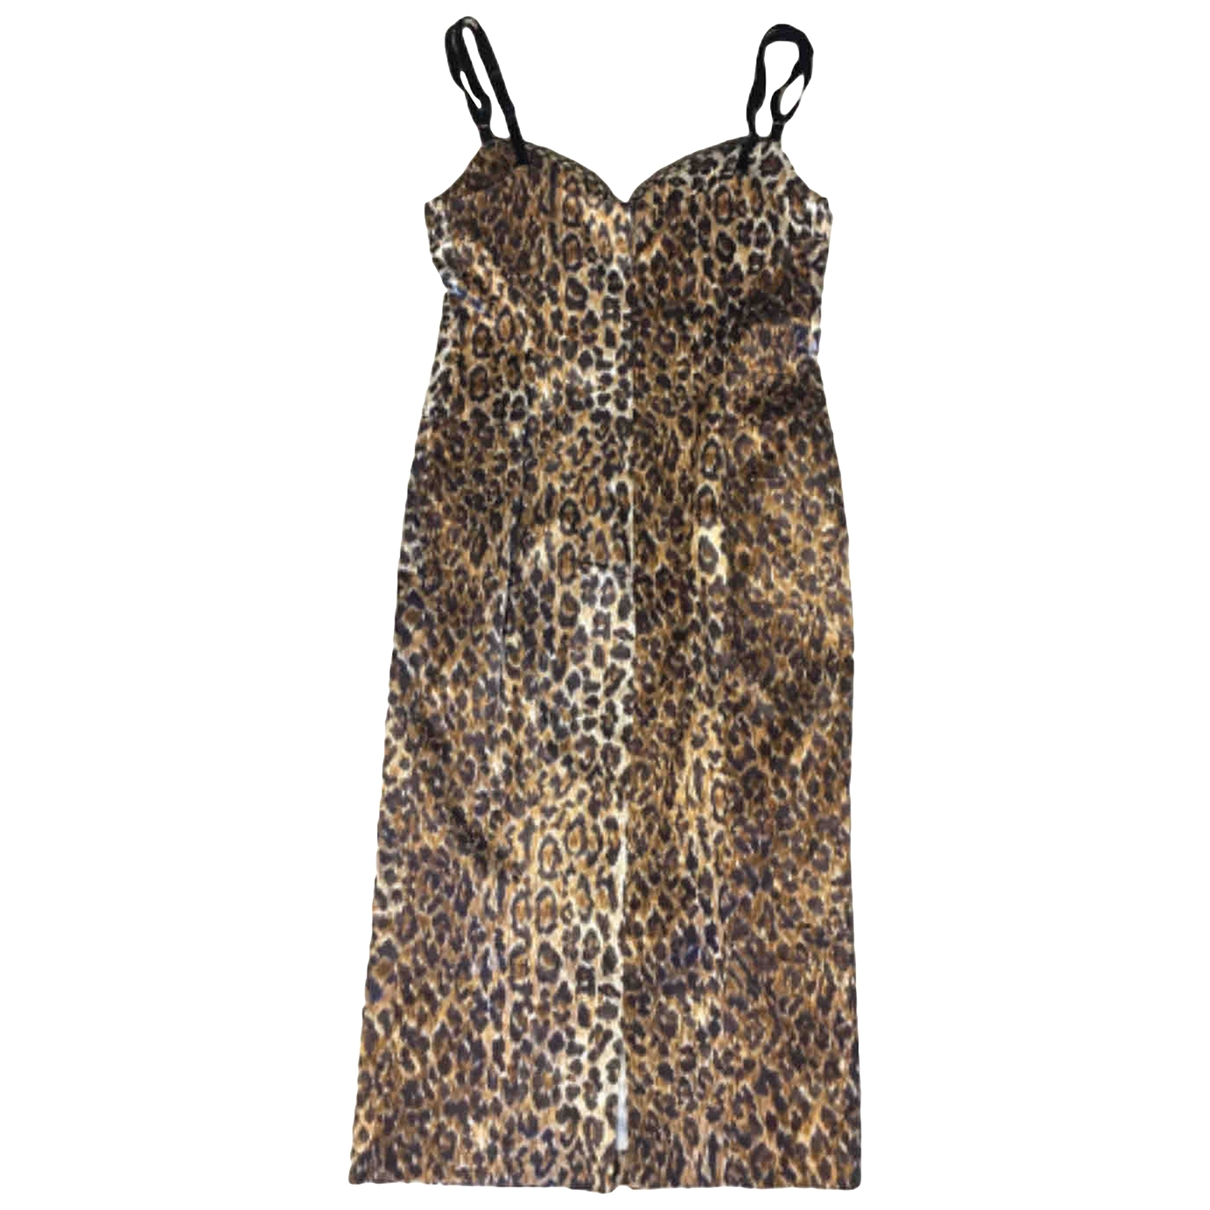 D&g \N Kleid in  Braun Baumwolle